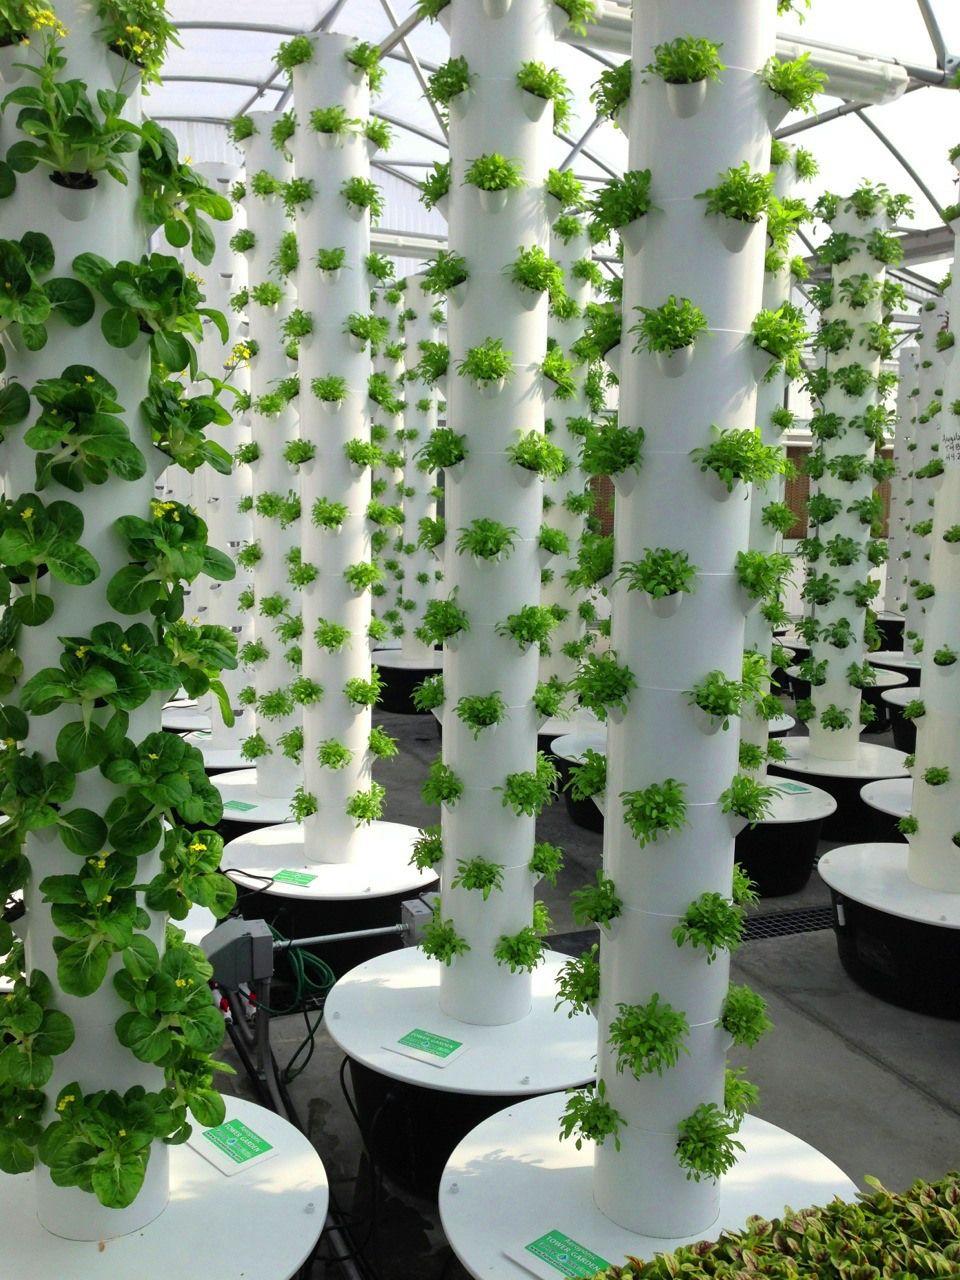 Local Tower Garden Farmer Produces Aeroponic Food For 640 x 480